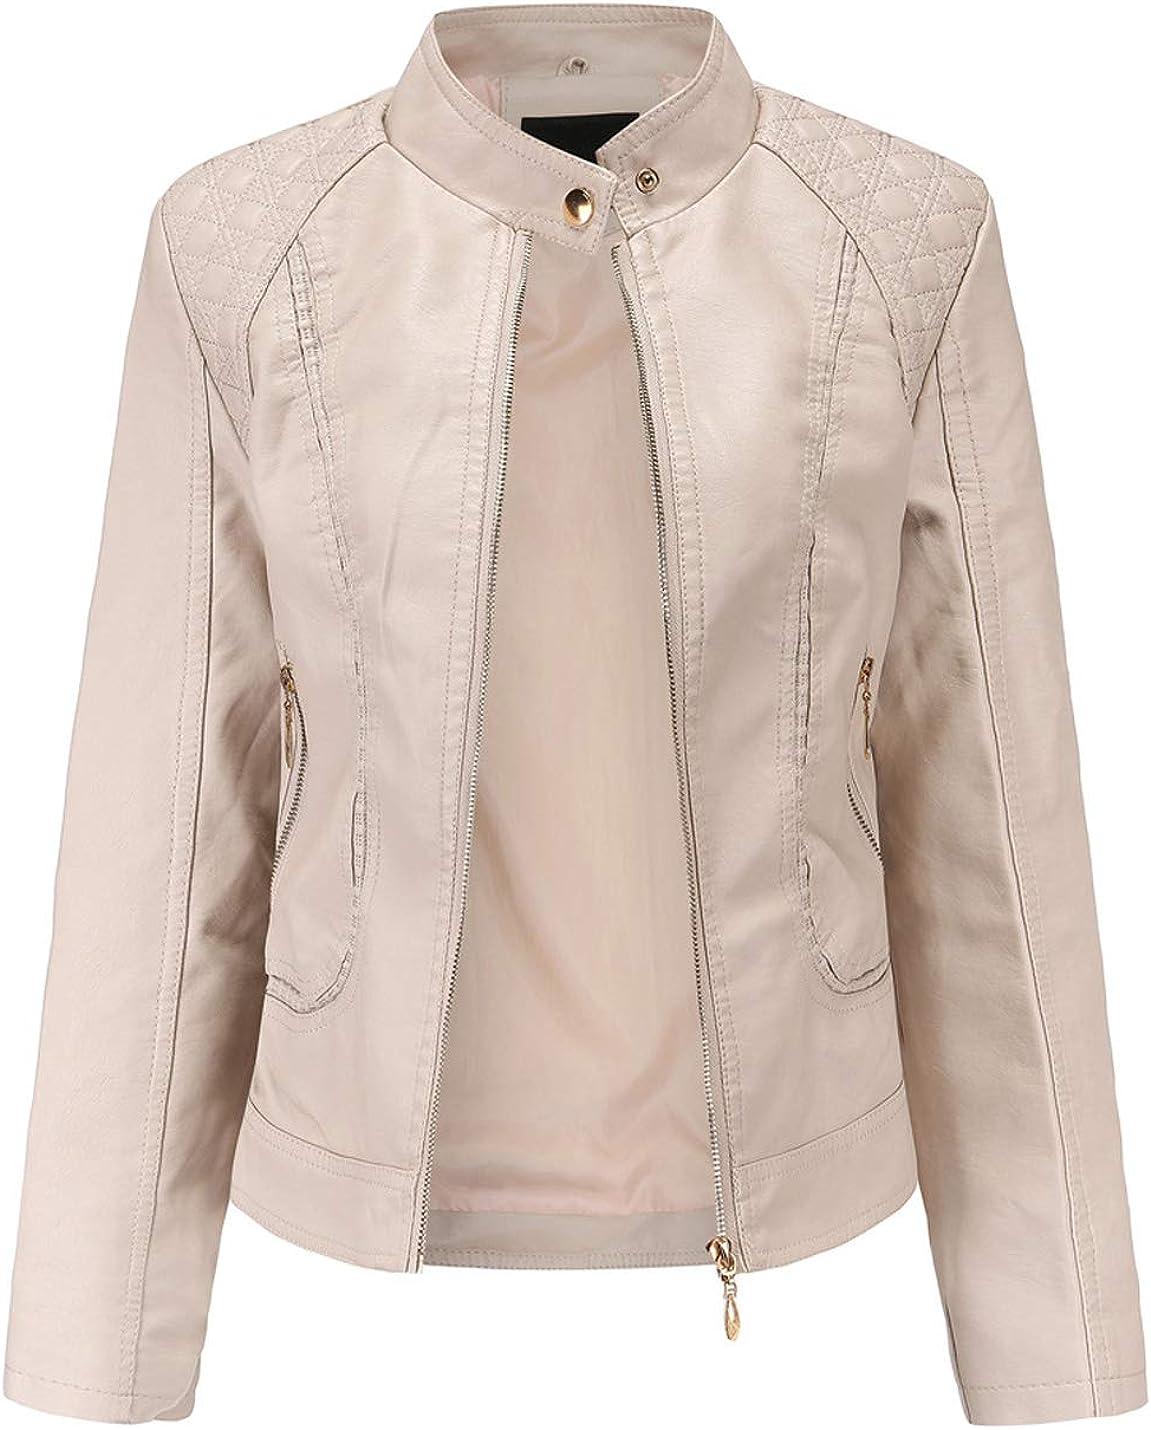 Gihuo Women's Casual PU Leather Moto Biker Jacket Outerwear